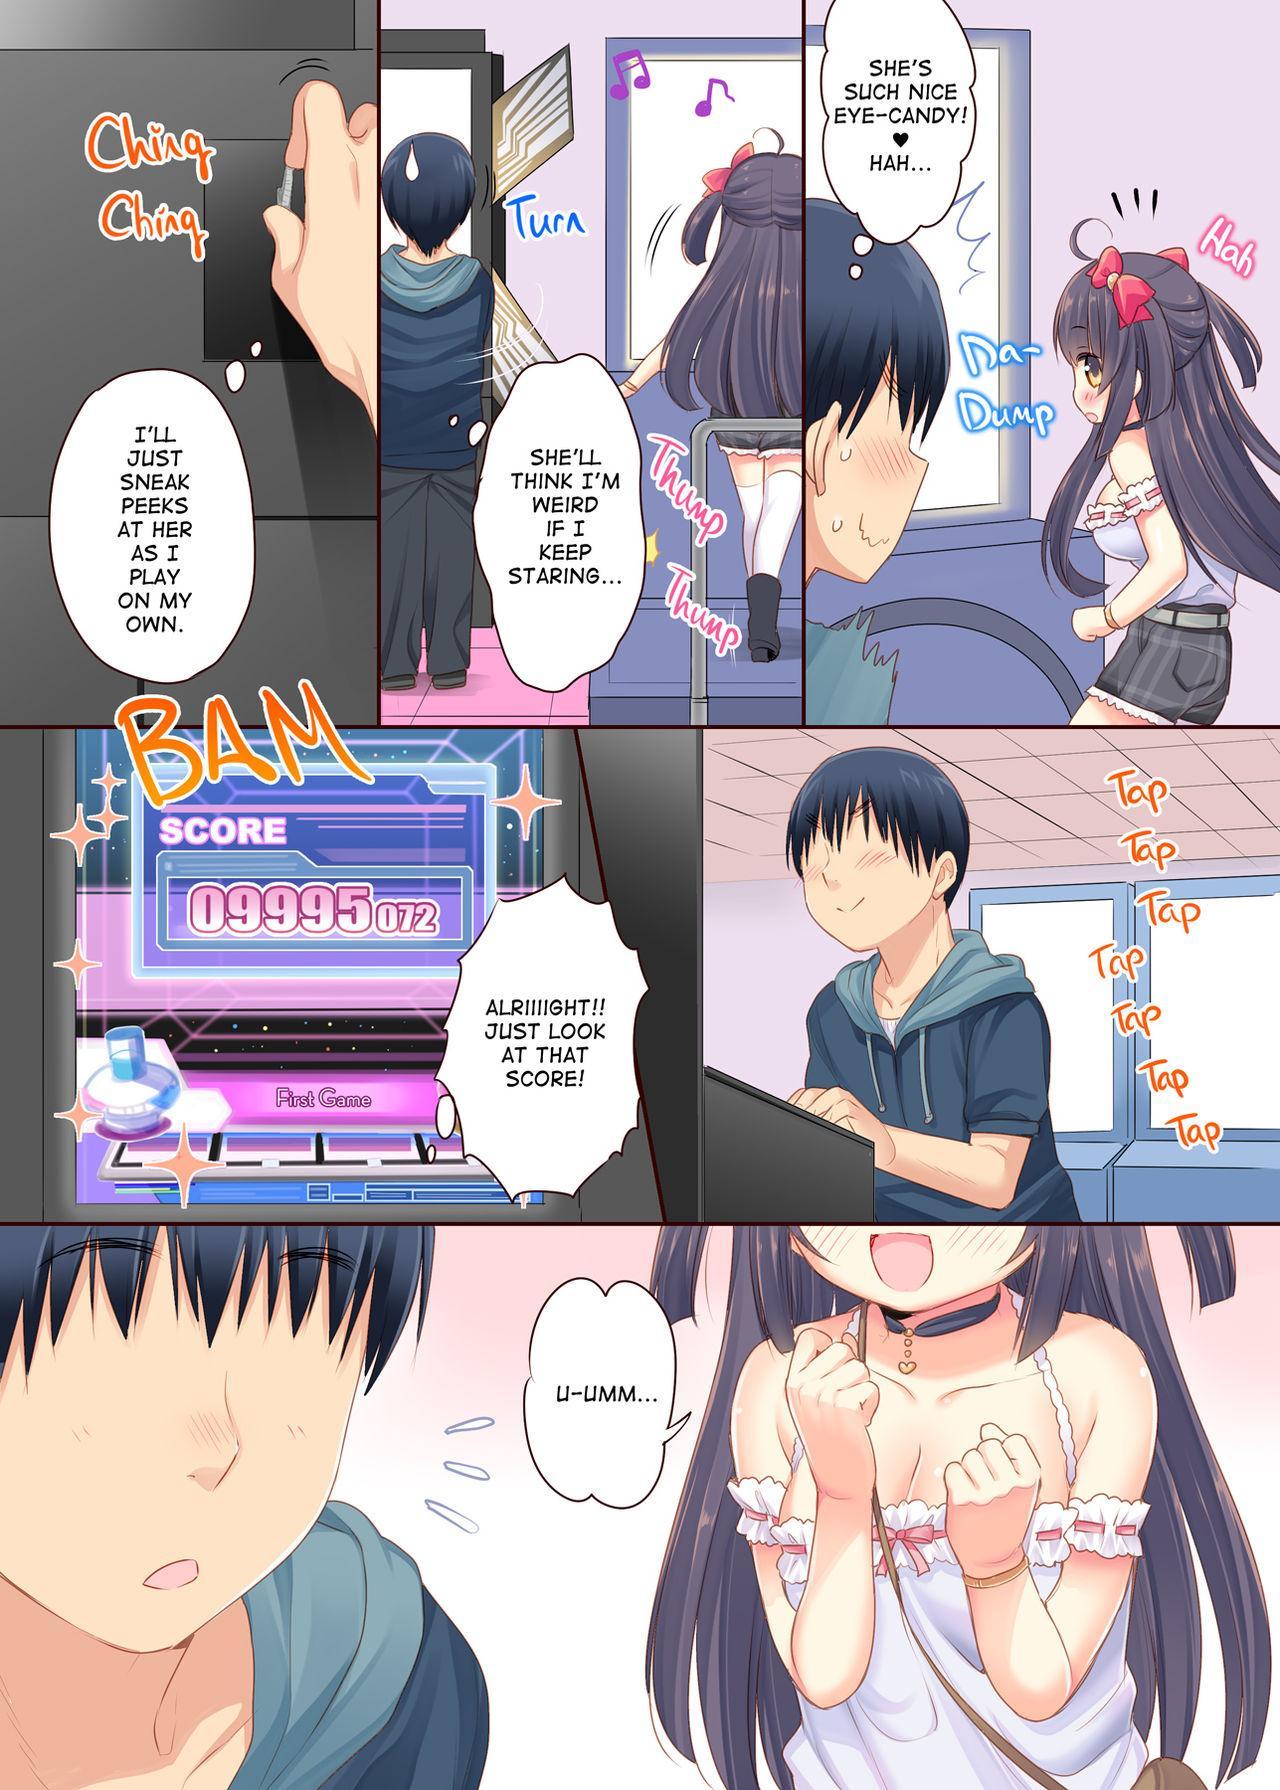 [Triangle! (Usashiro Mani)] GaCen Hime to DT Otoko no Ichaicha Kozukuri Love Sex   Arcade Princess And a Virgin Boy Who Make Out And Have Lovey-Dovey Baby-Making Sex [English] [2d-market.com] [Decensored] [Digital] 2